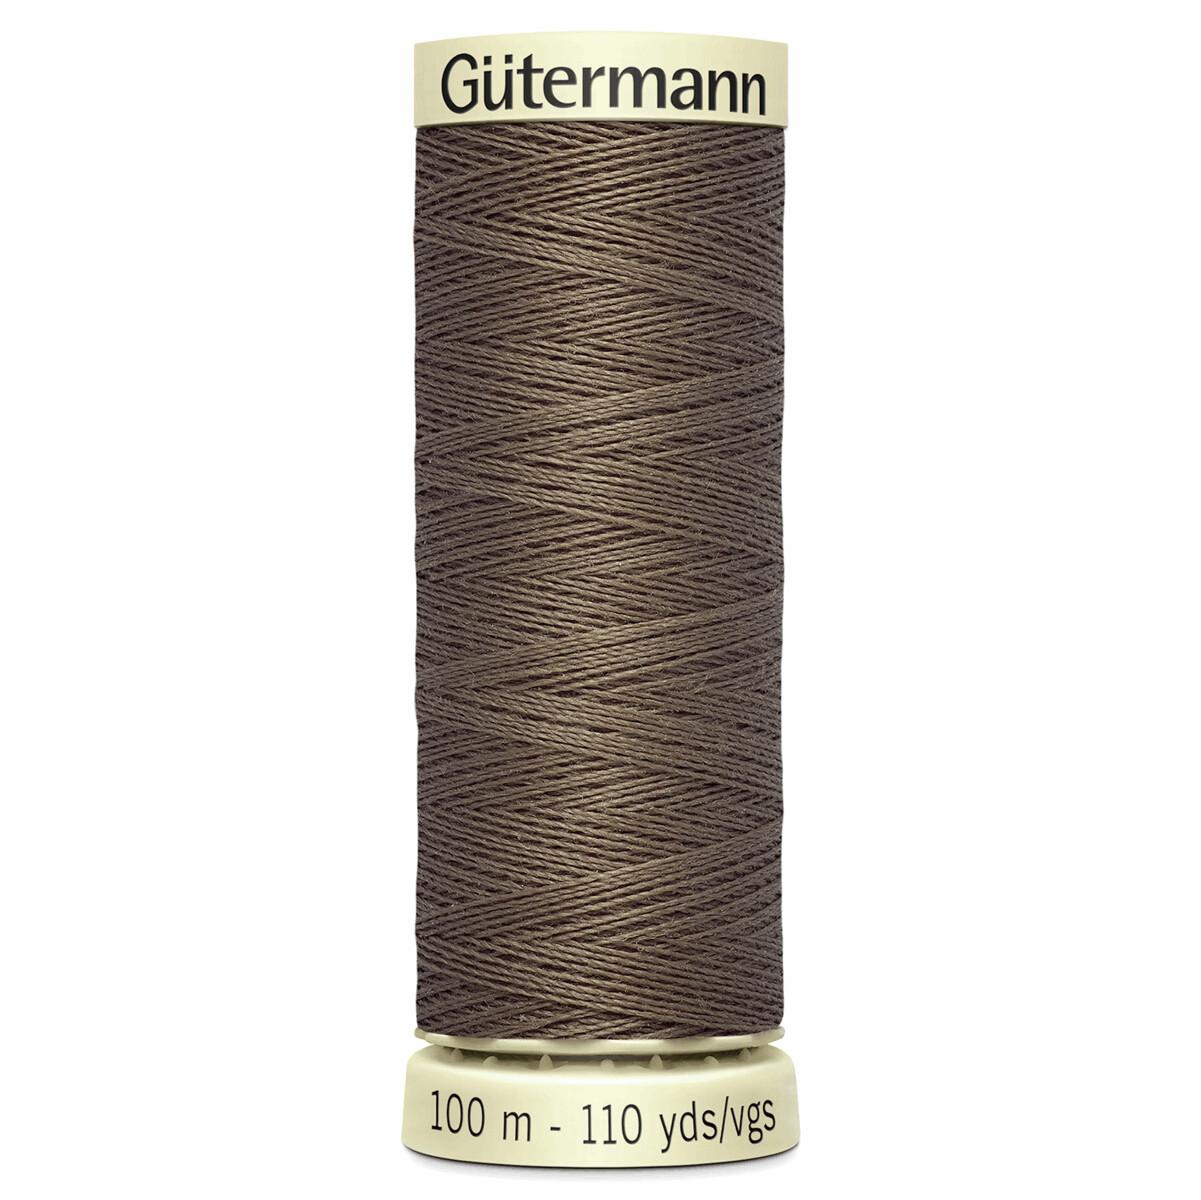 Gutermann Sew-All thread 209